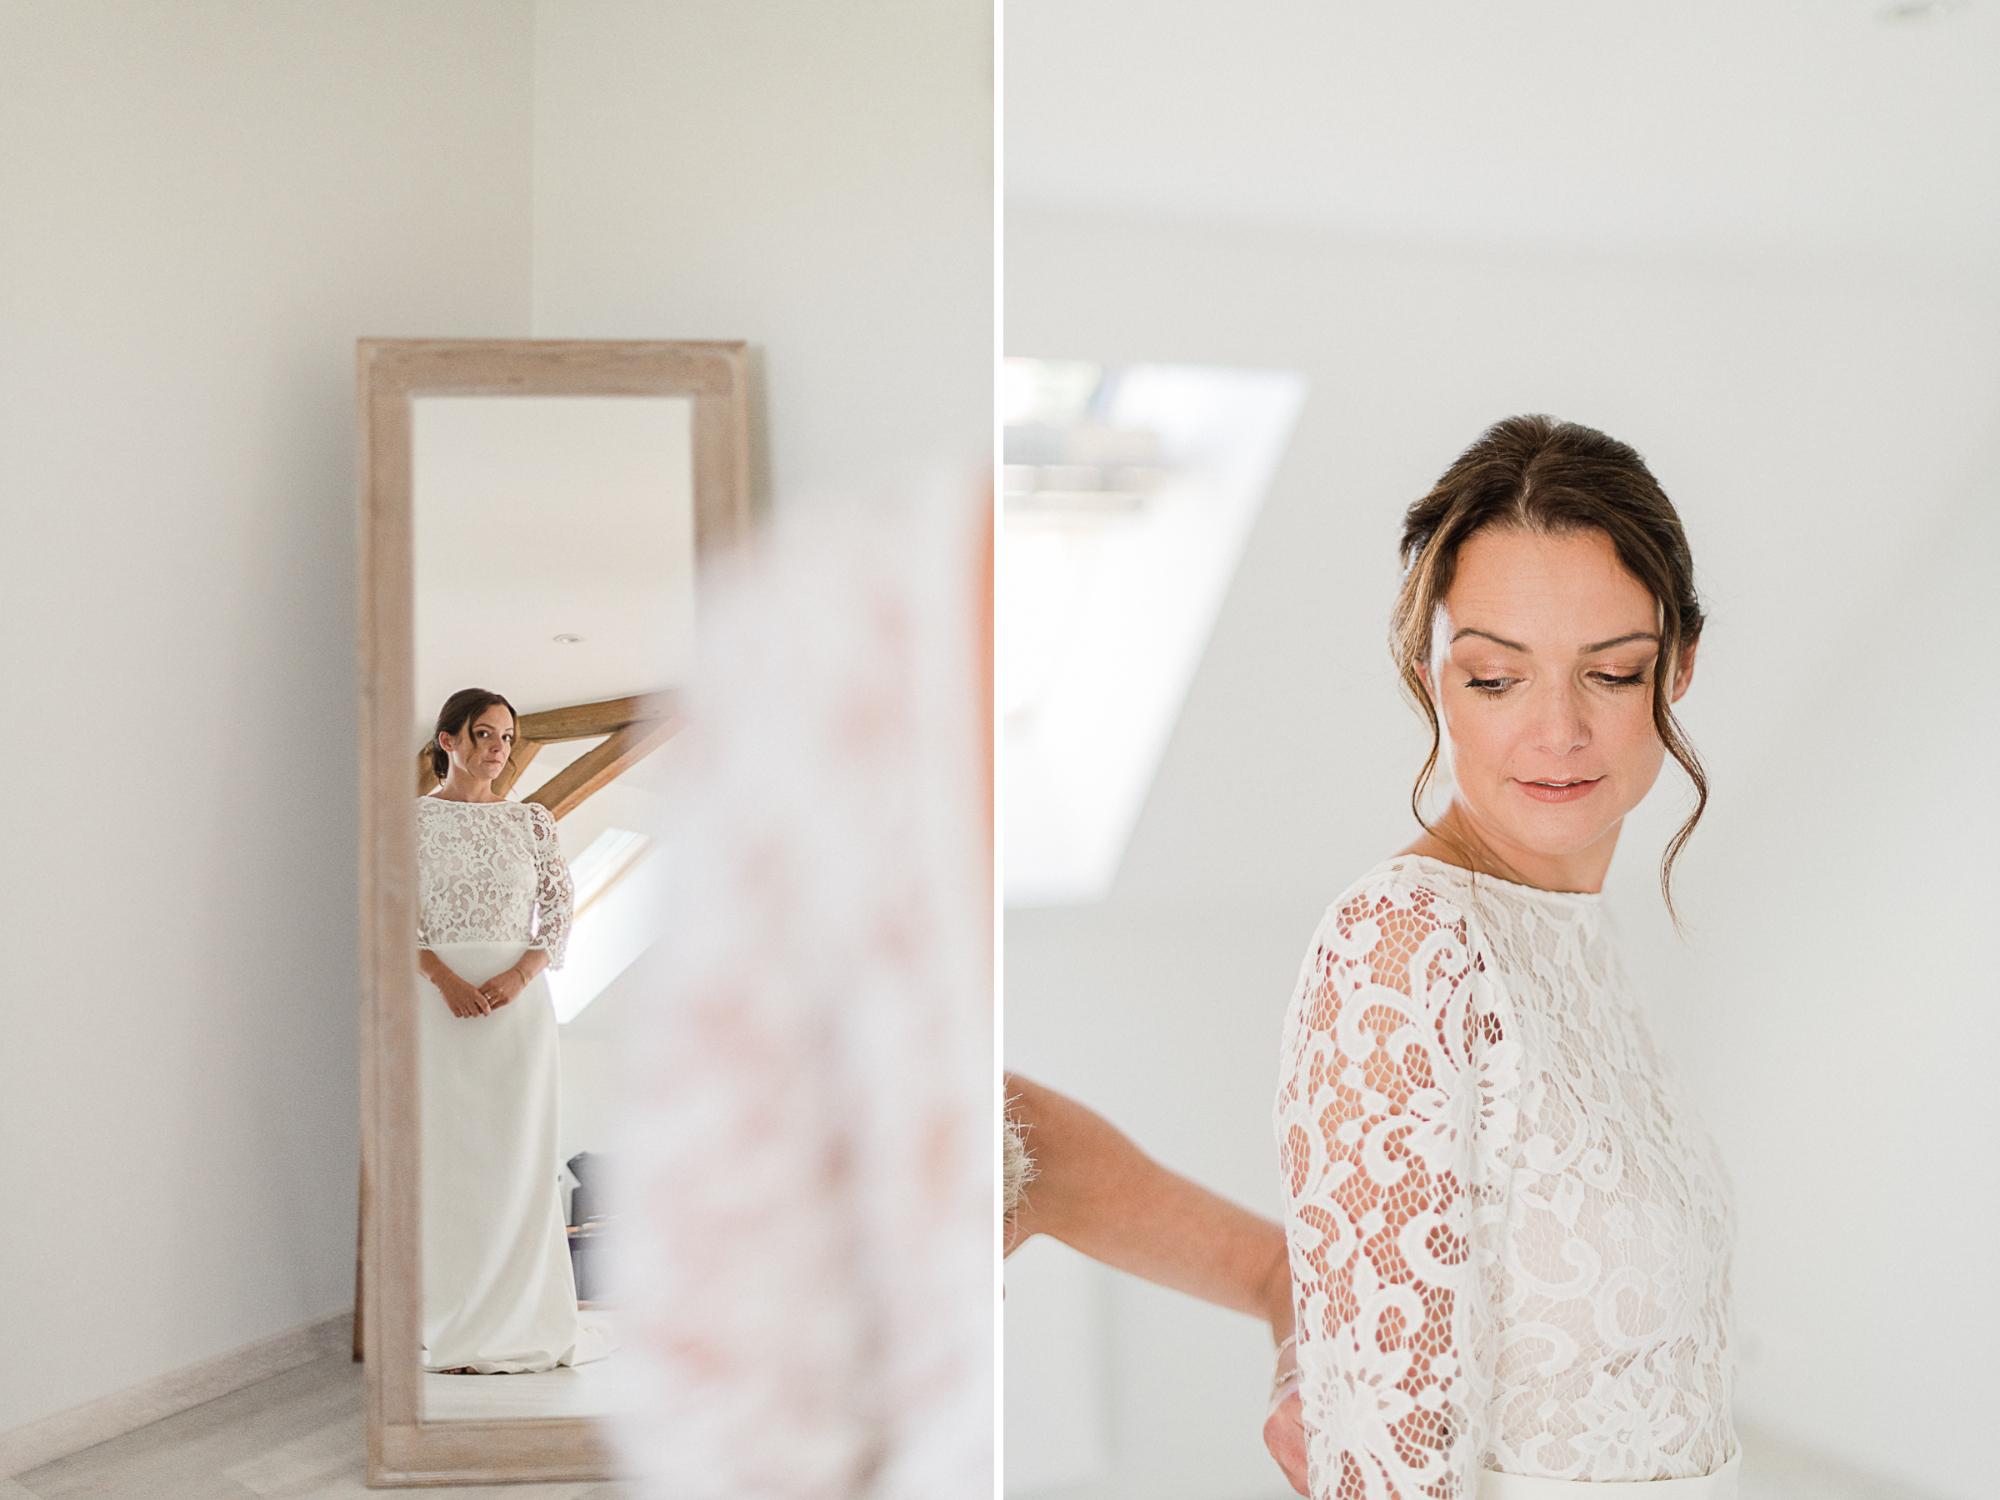 priscillapuzenat-photographe-mariage-bazoches-chateau-nievre-morvan-bourgogne-robe-preparatifs-femme